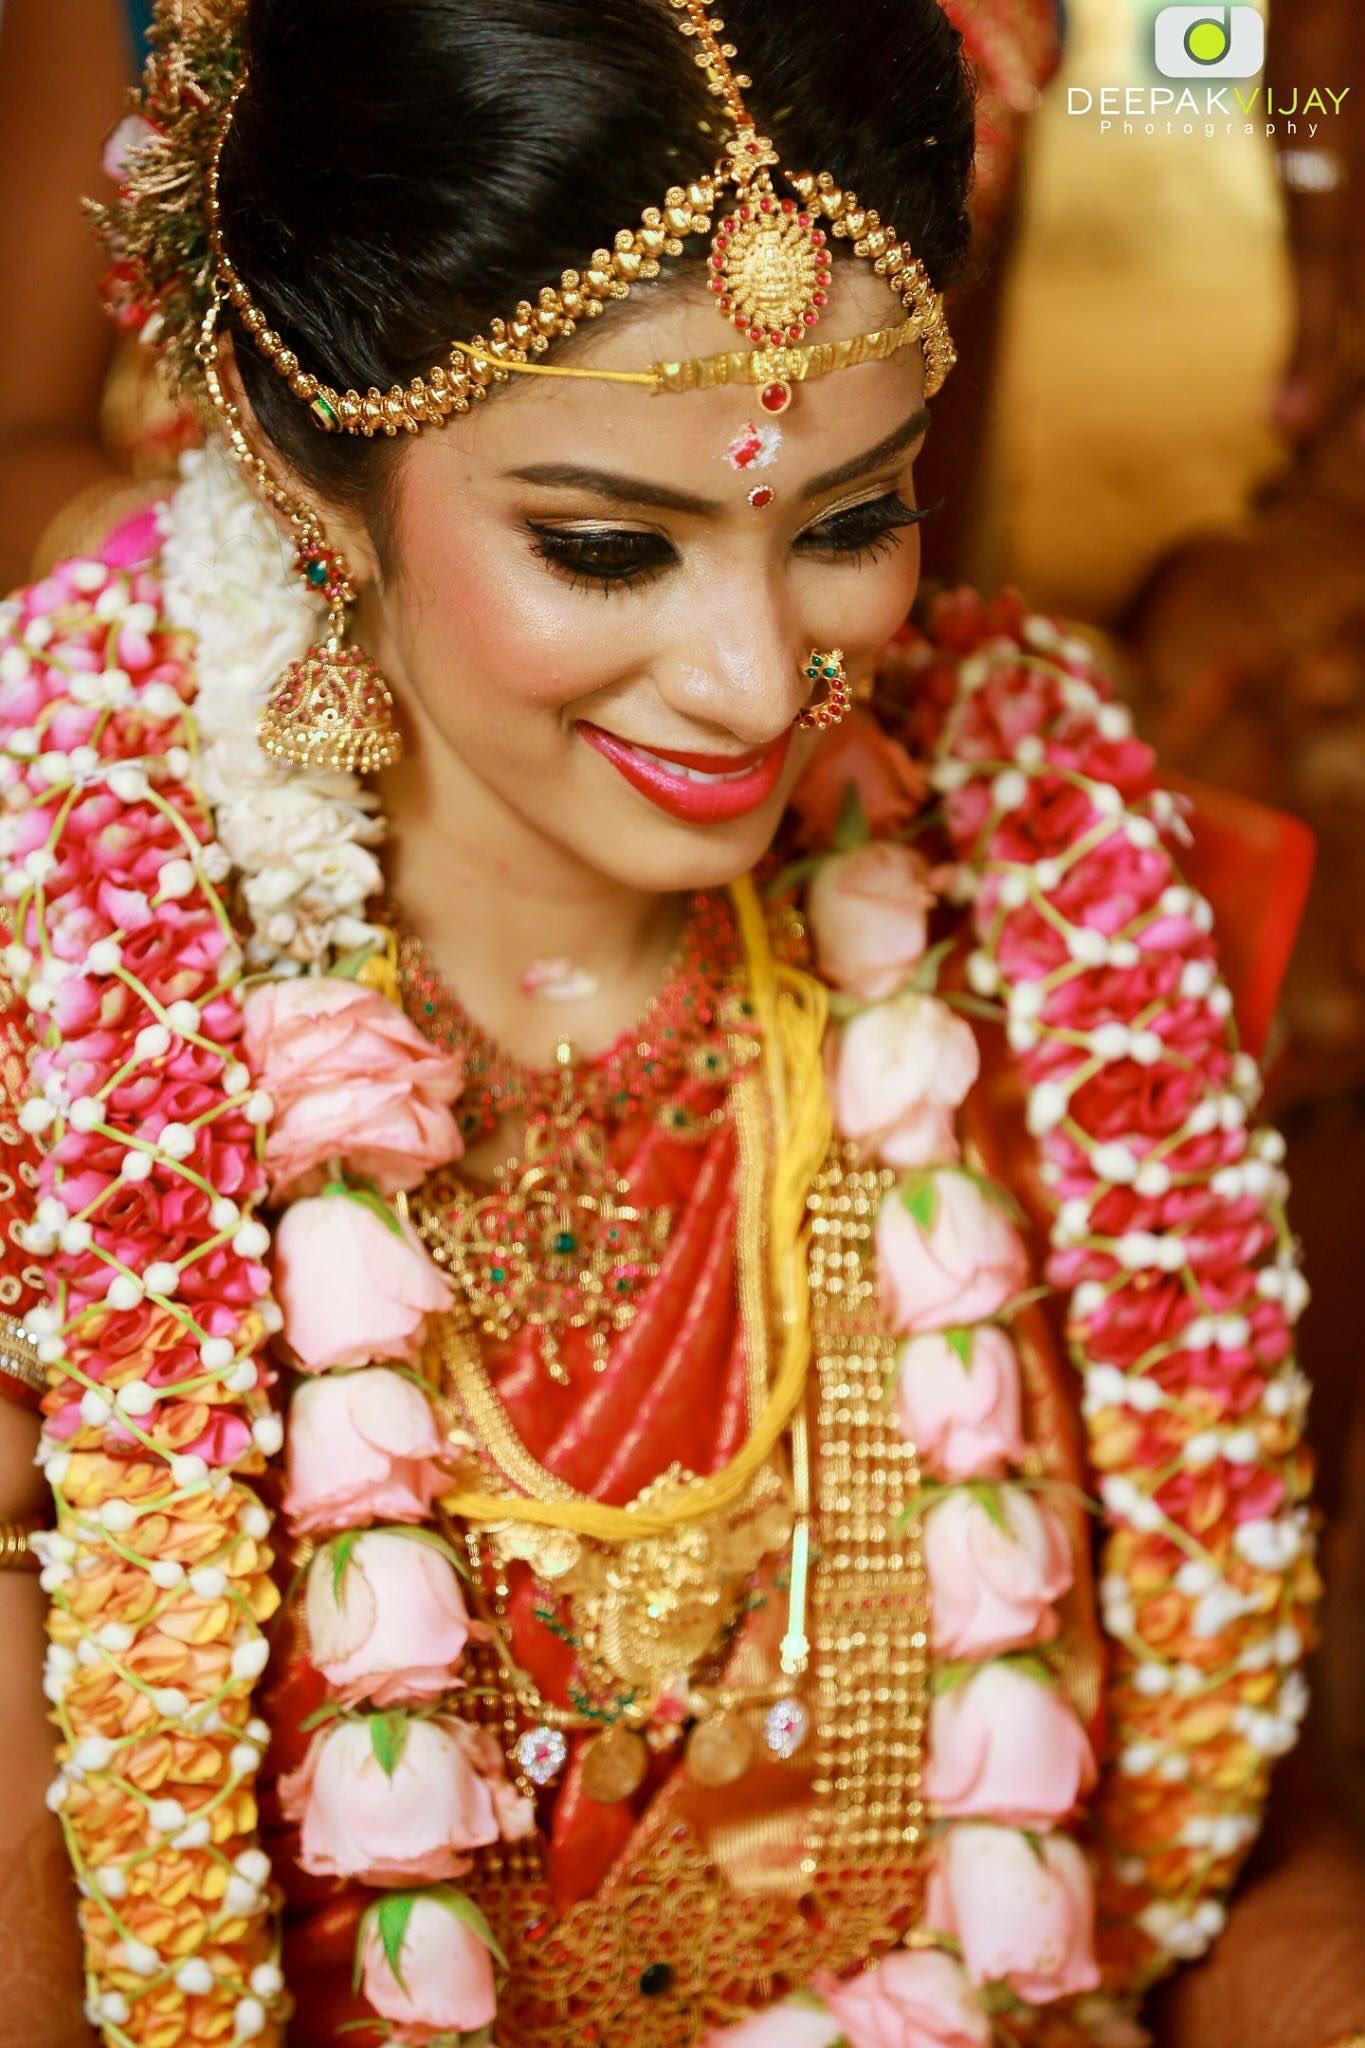 Diya Vj On Twitter Wedding Pics Httpstco